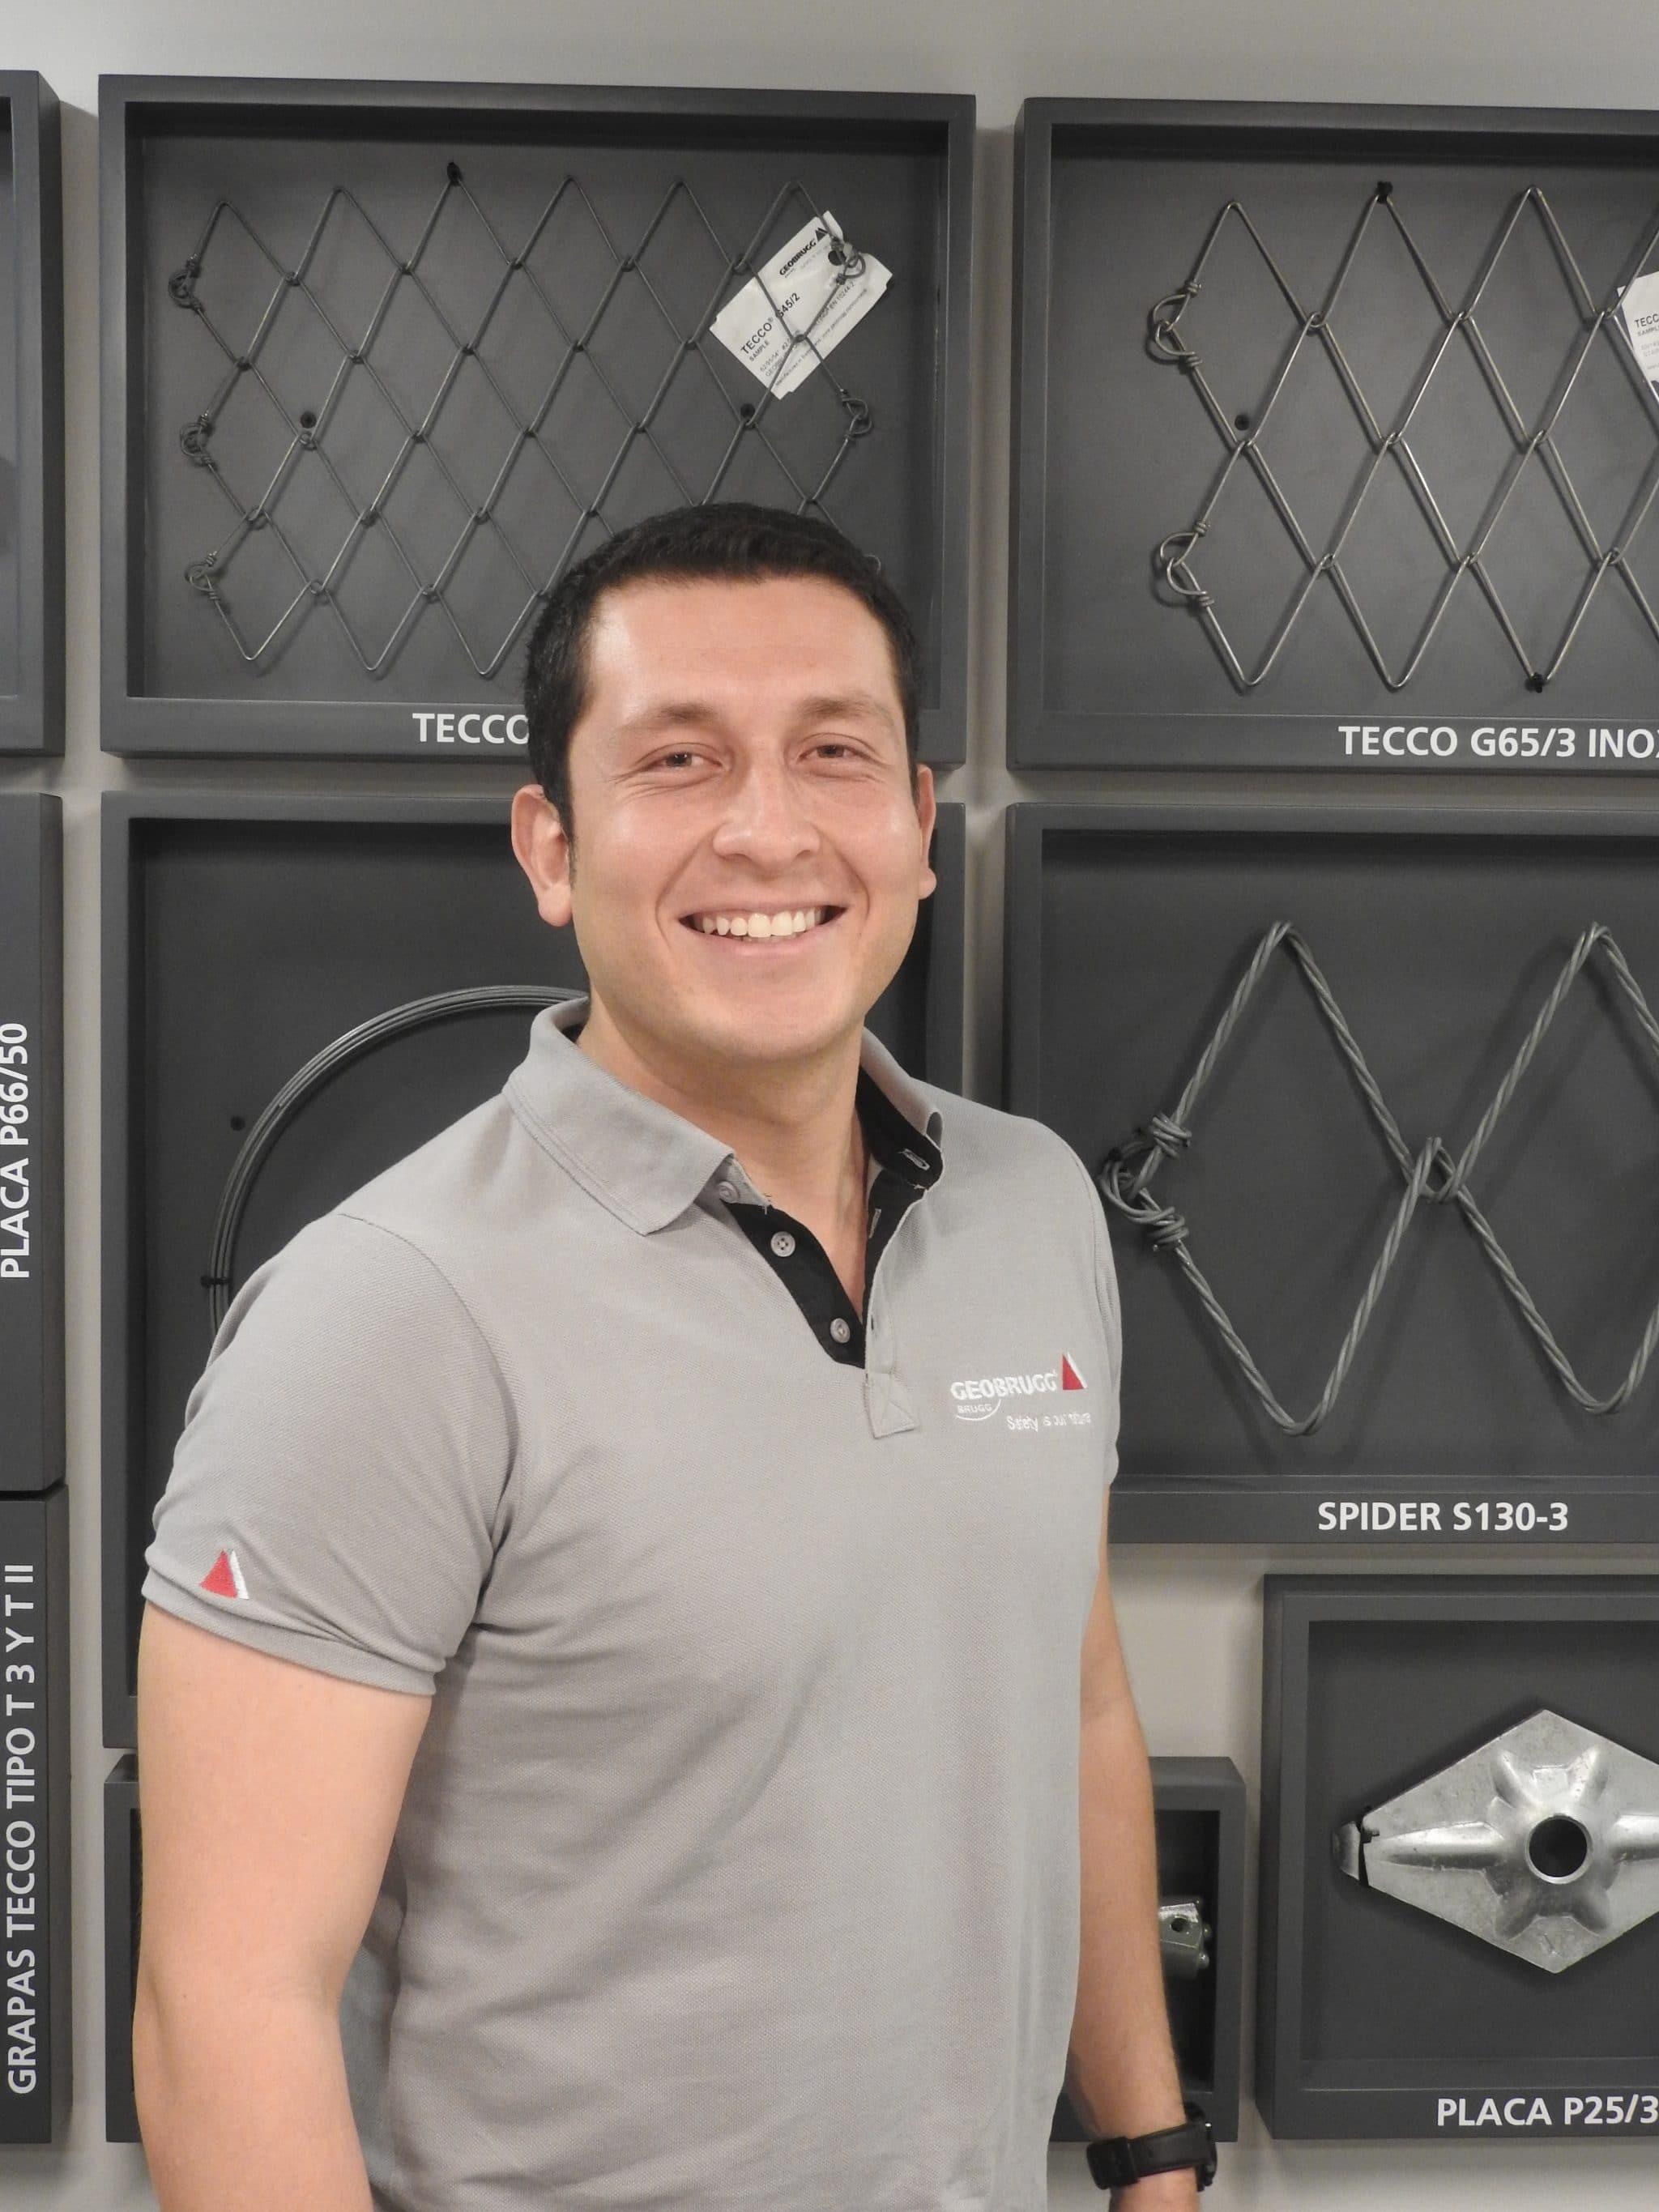 Luis Carlos Díaz Martínez